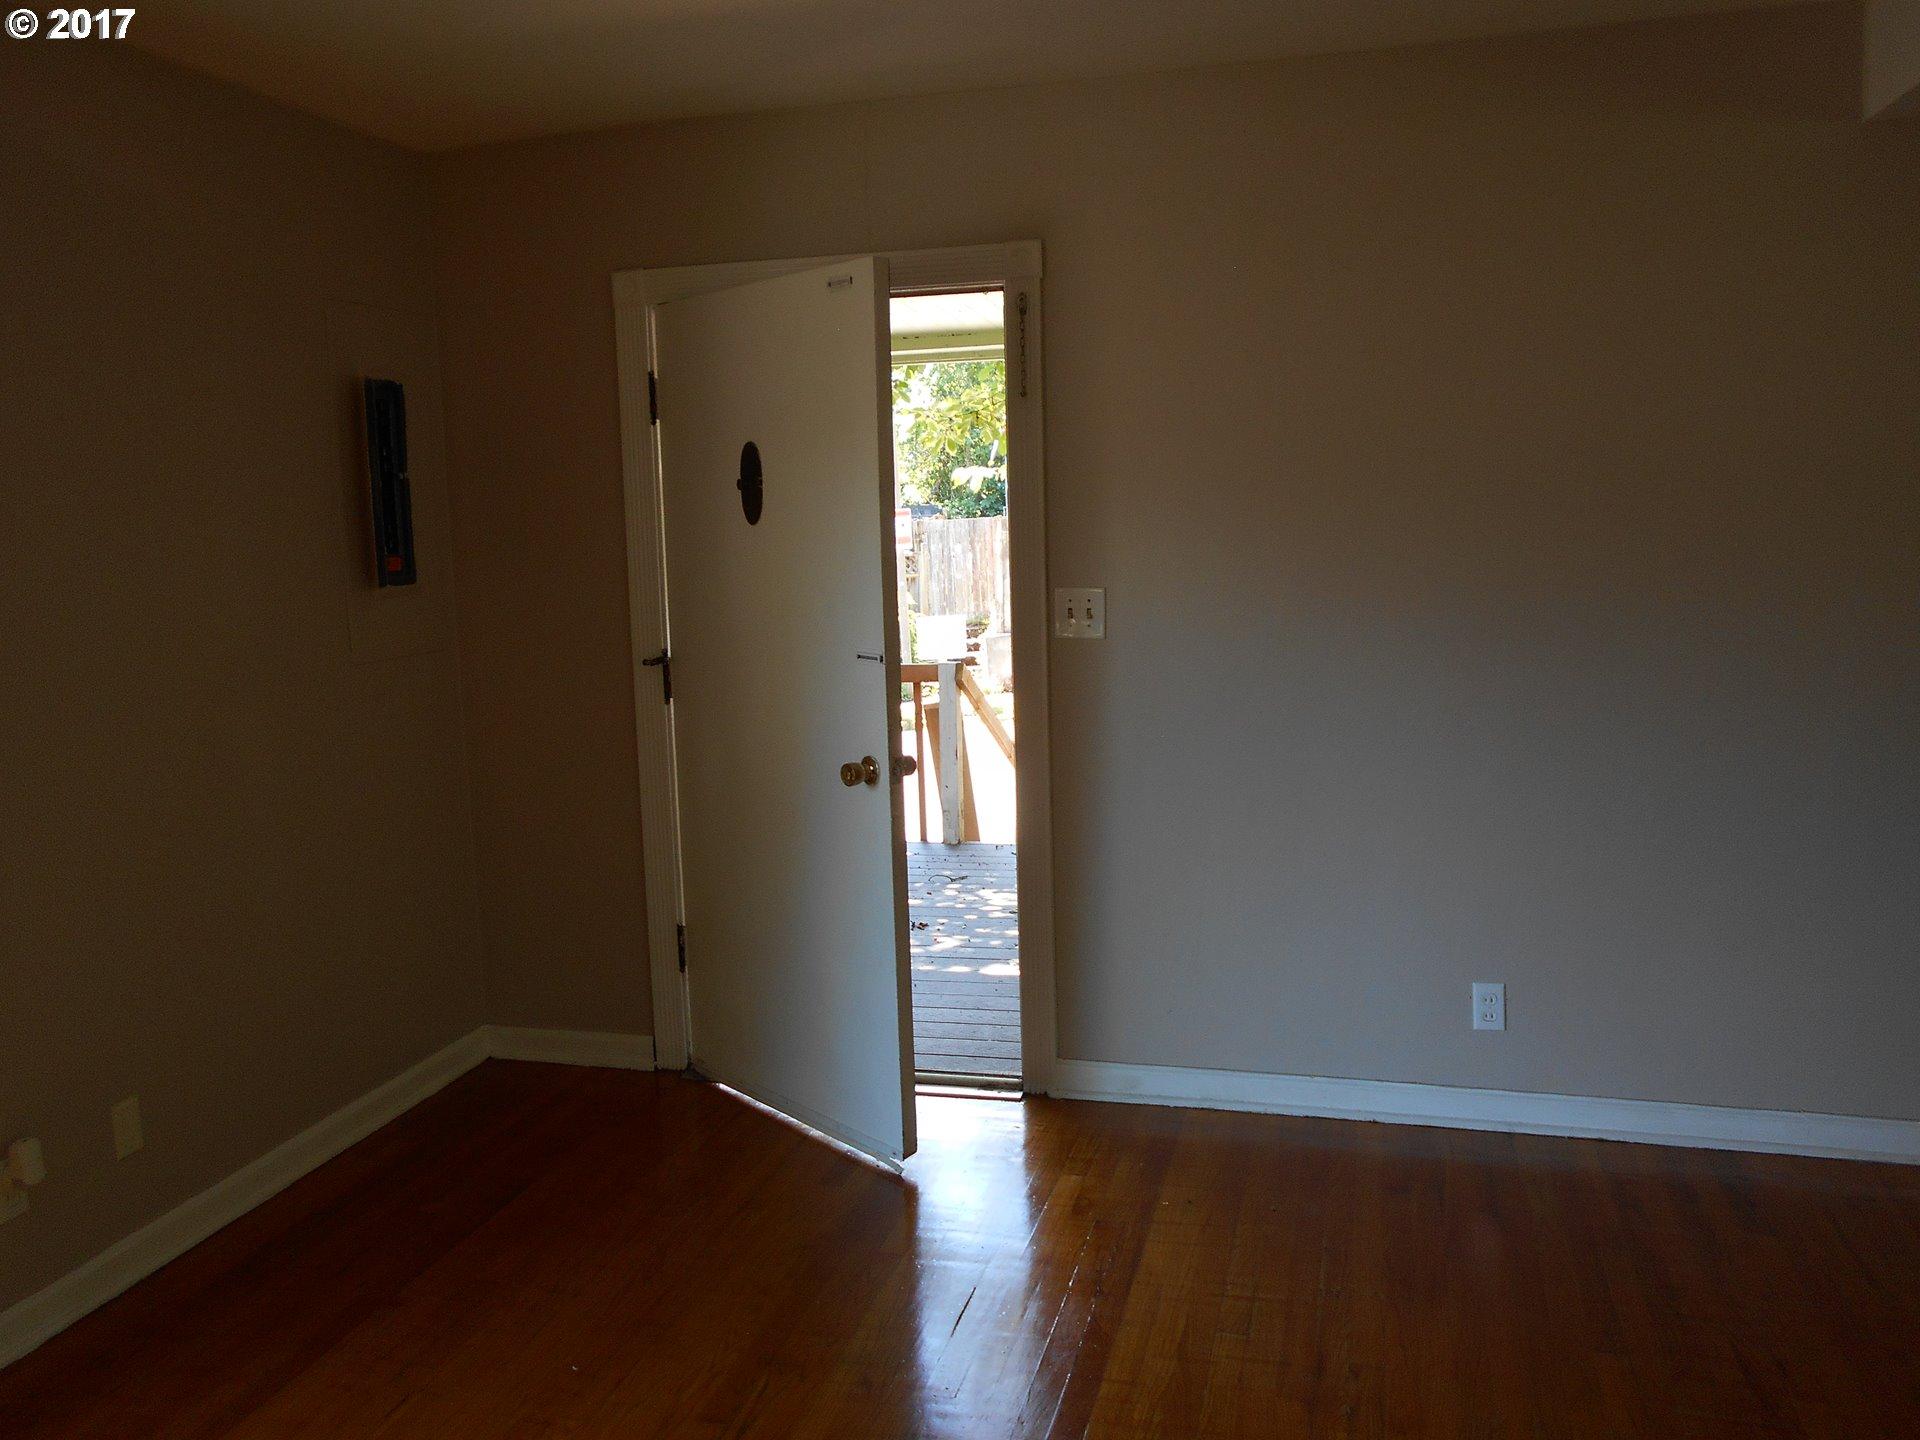 11595 SW GREENBURG RD Tigard, OR 97223 - MLS #: 17617738